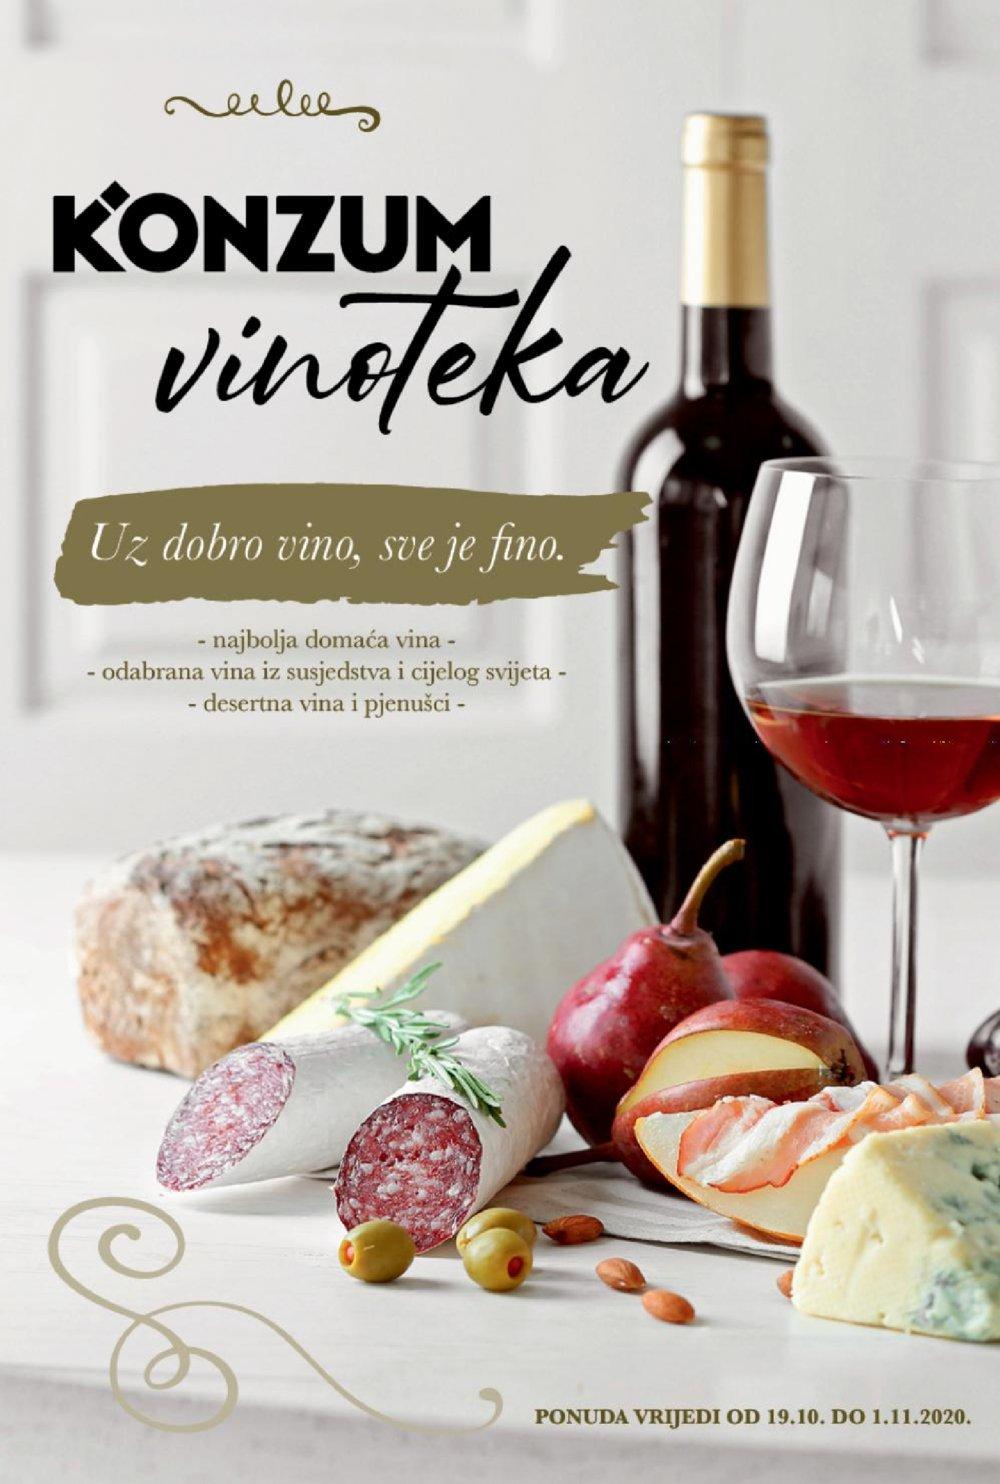 Konzum katalog Akcija Vinoteka 19.10.-01.11.2020.